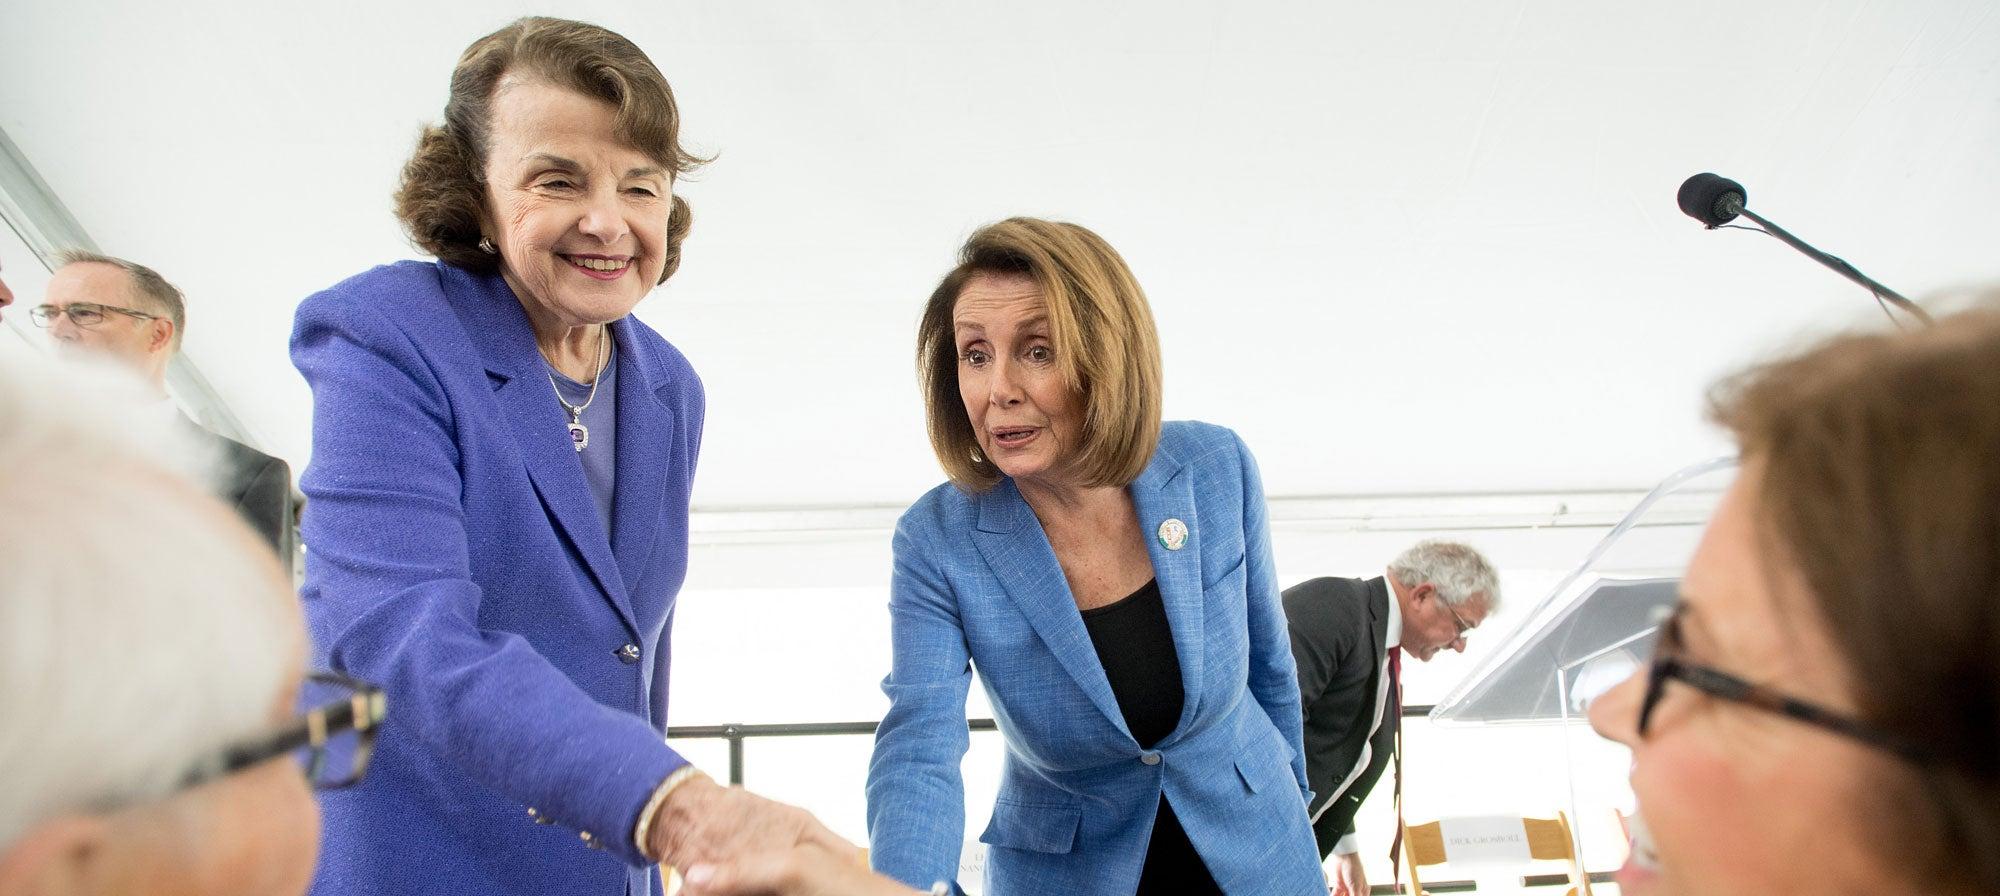 Senator Dianne Feinstein and House Democratic Leader Nancy Pelosi